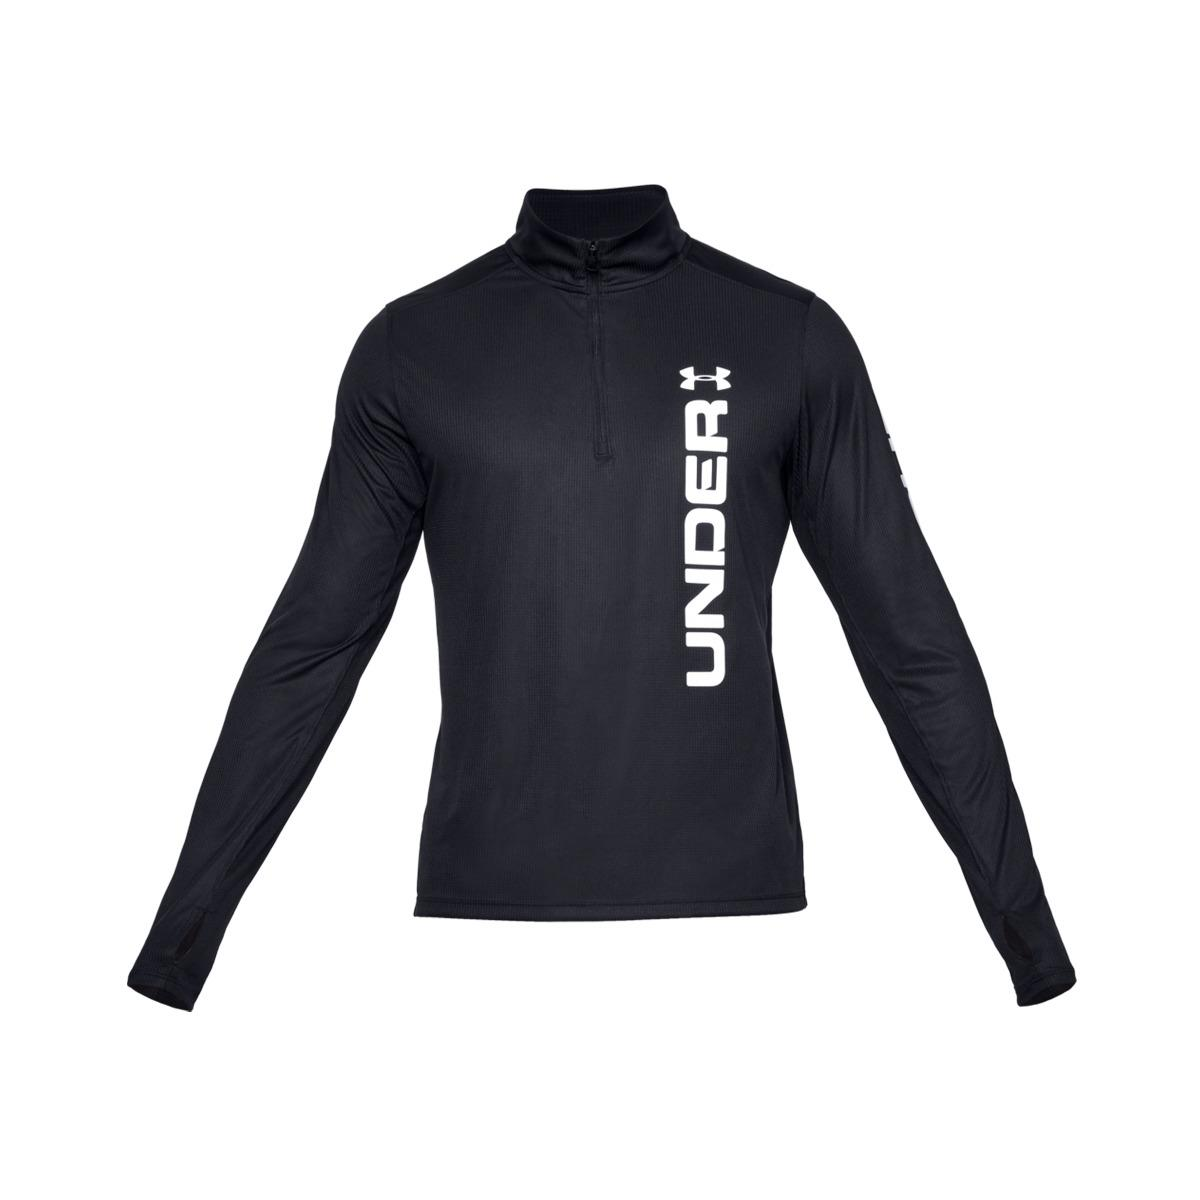 9f1d35adec3 Lyst - Under Armour Camiseta De Hombre Speed Stride Spli in Black ...